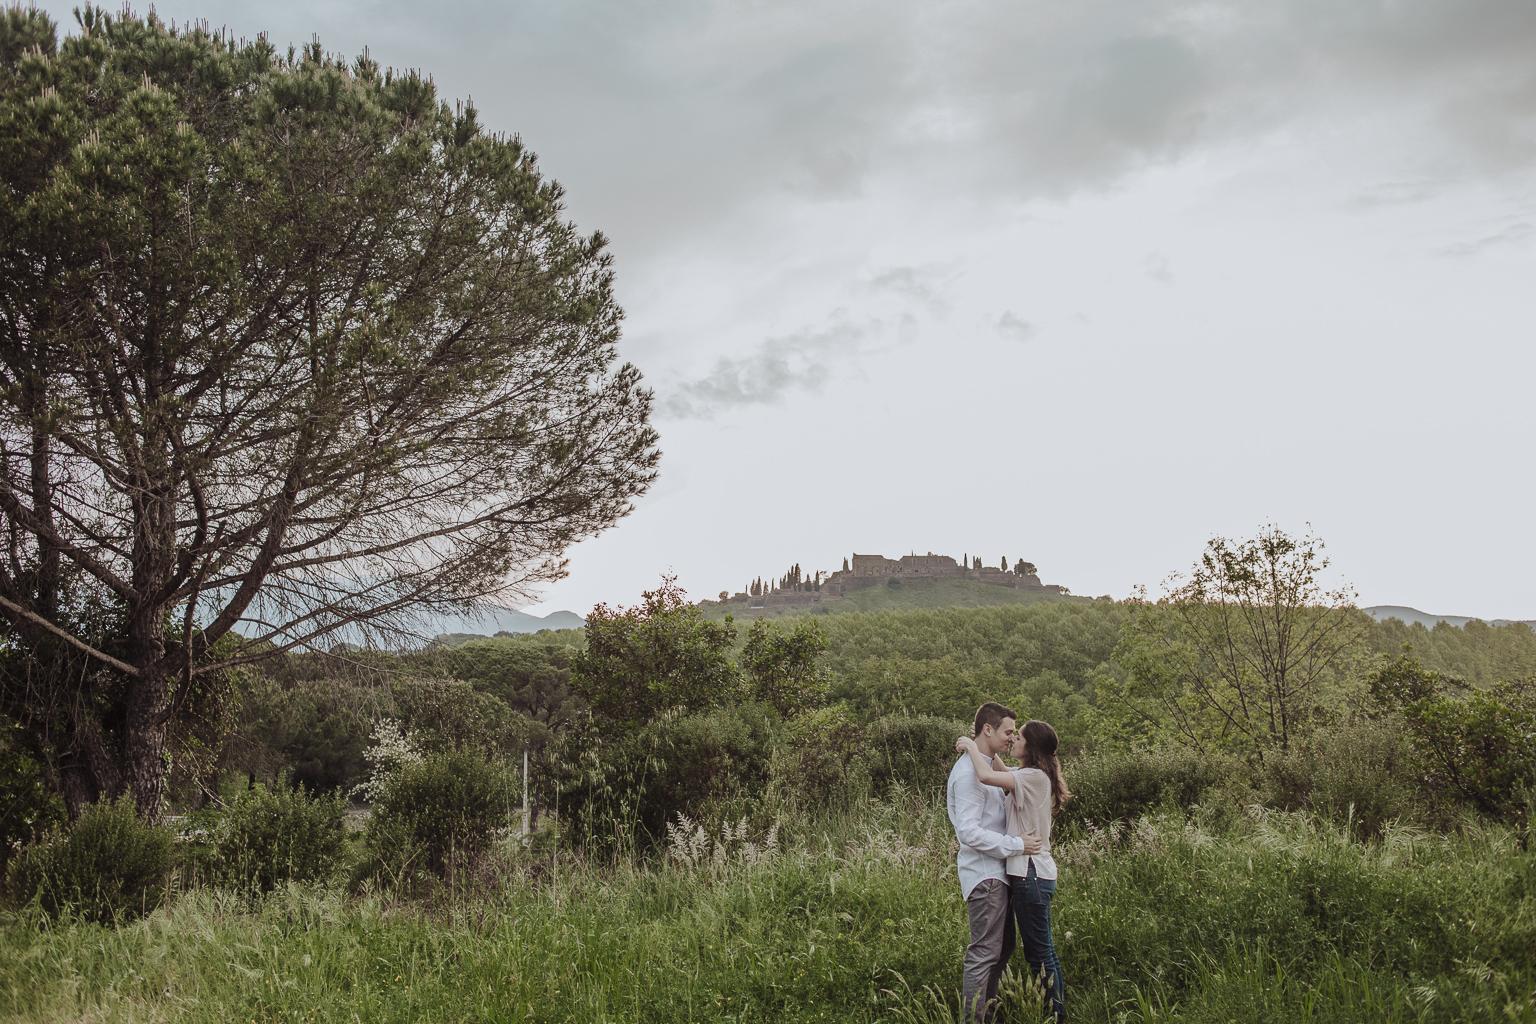 Fot grafo preboda barcelona fot grafo de pareja en - Fotografo en barcelona ...